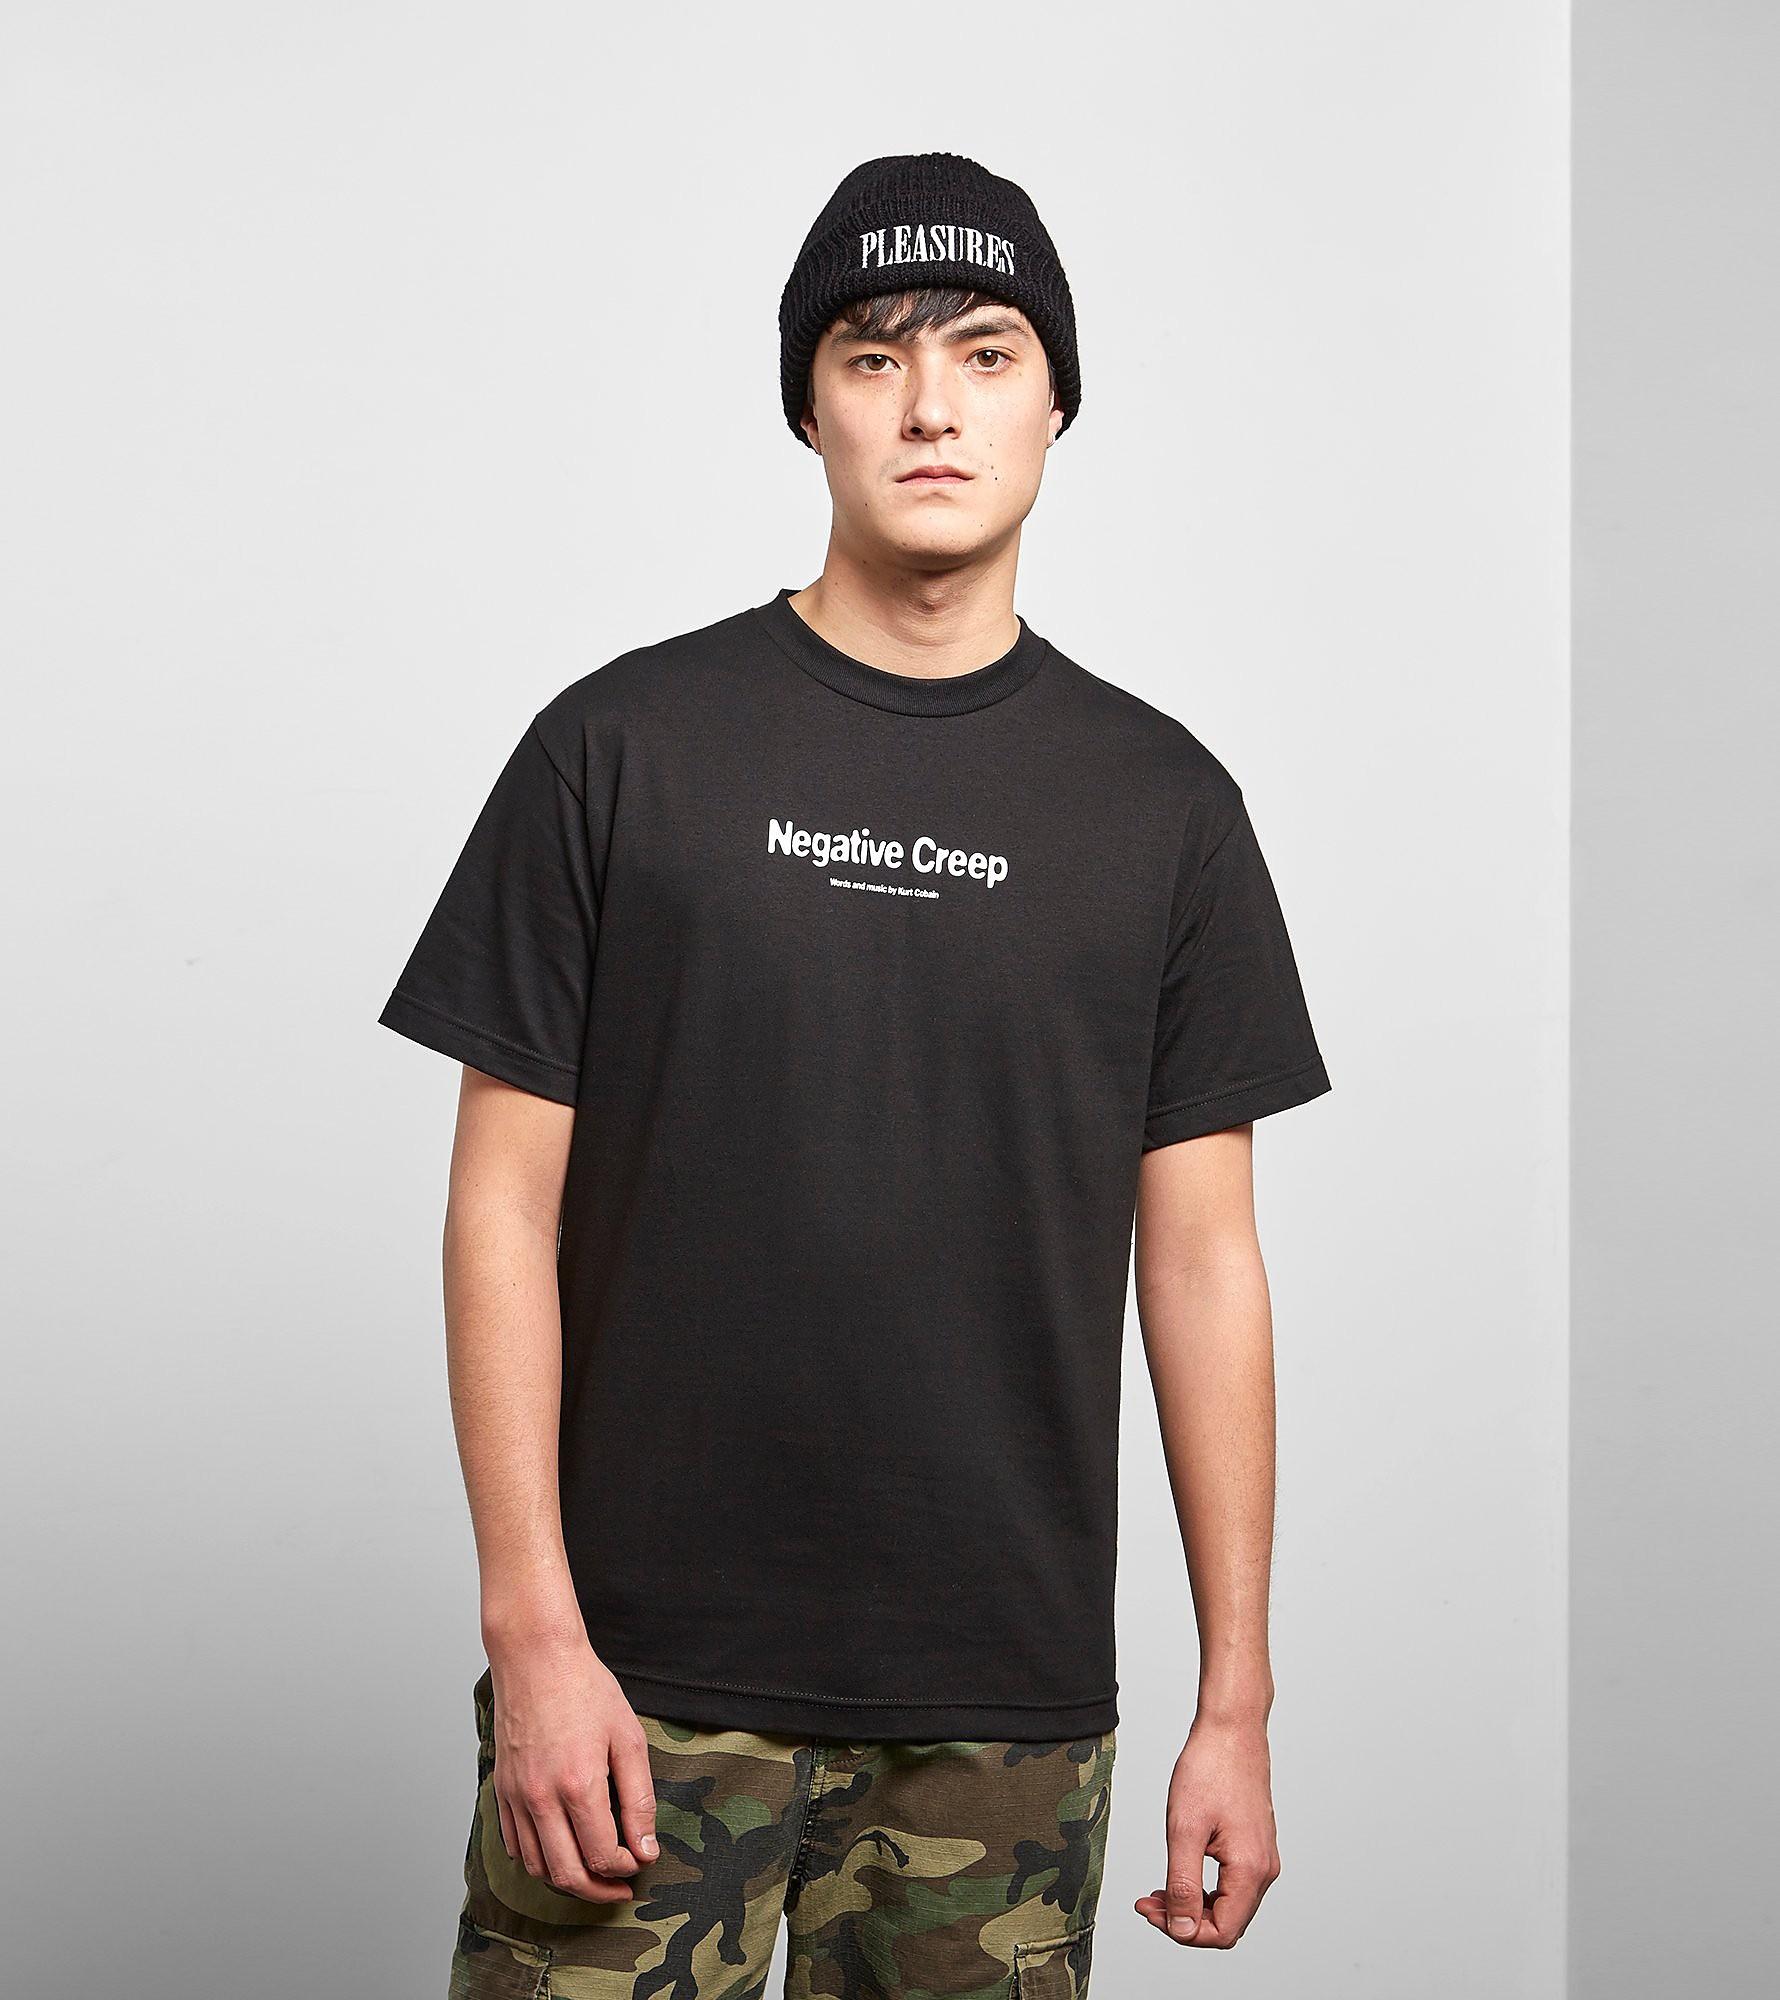 PLEASURES Sheet Music T-Shirt